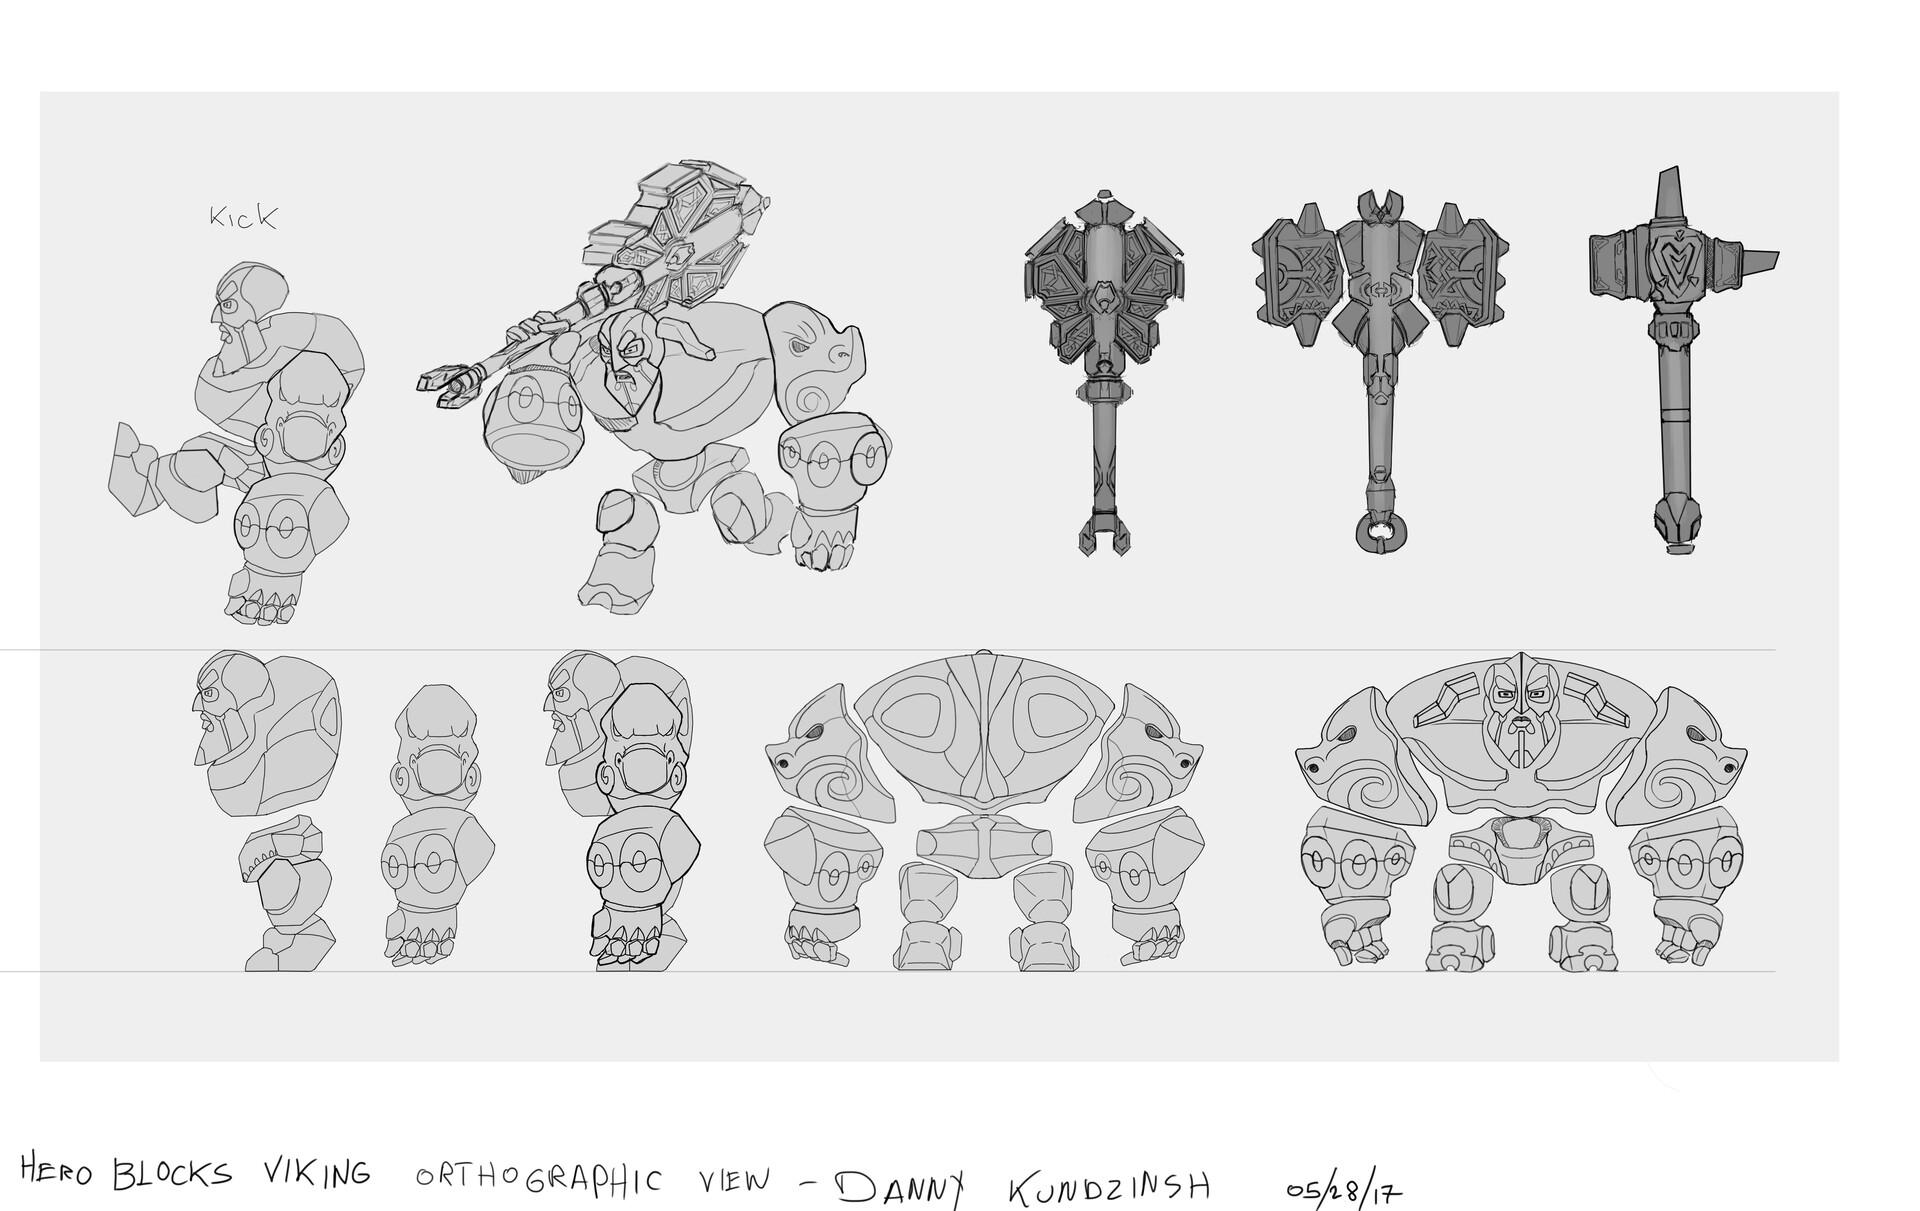 Danny kundzinsh danny kundzinsh hero blocks viking concept art orthos v1